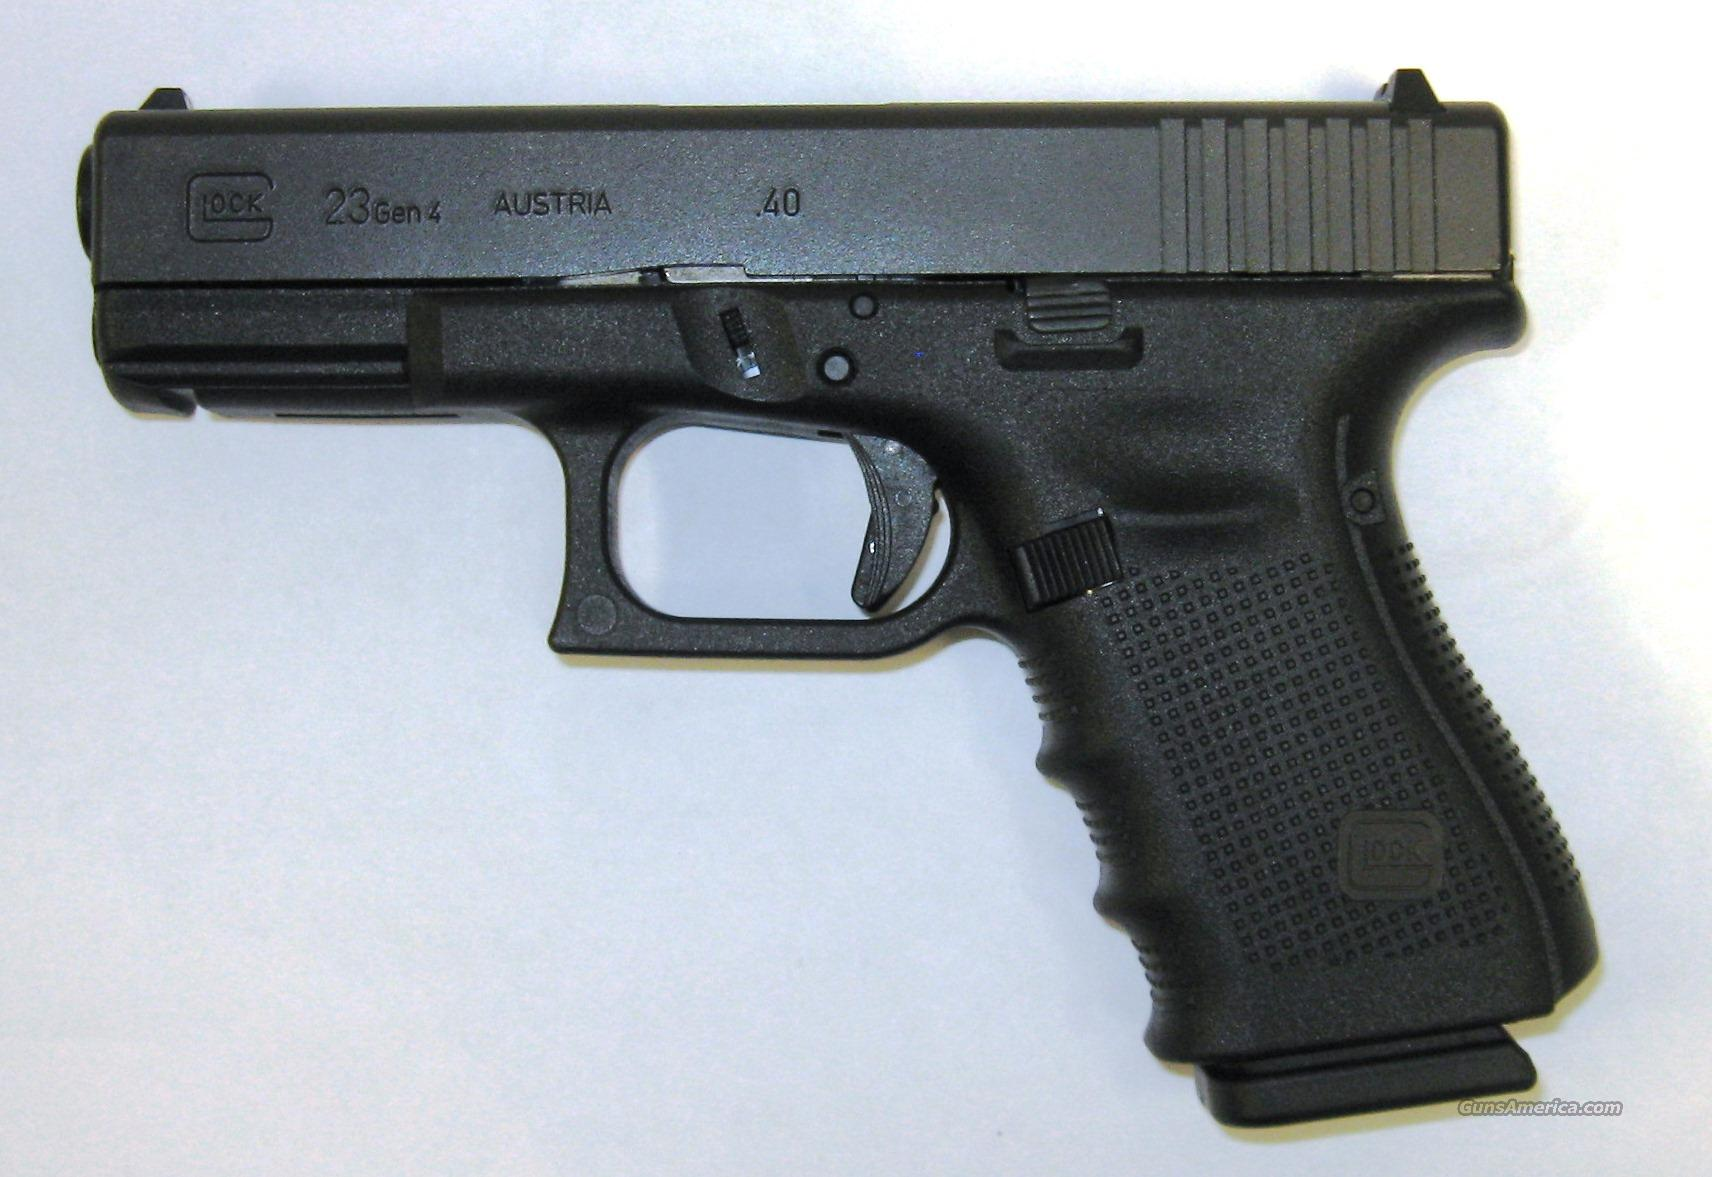 Glock 23 Gen 4  Guns > Pistols > Glock Pistols > 23